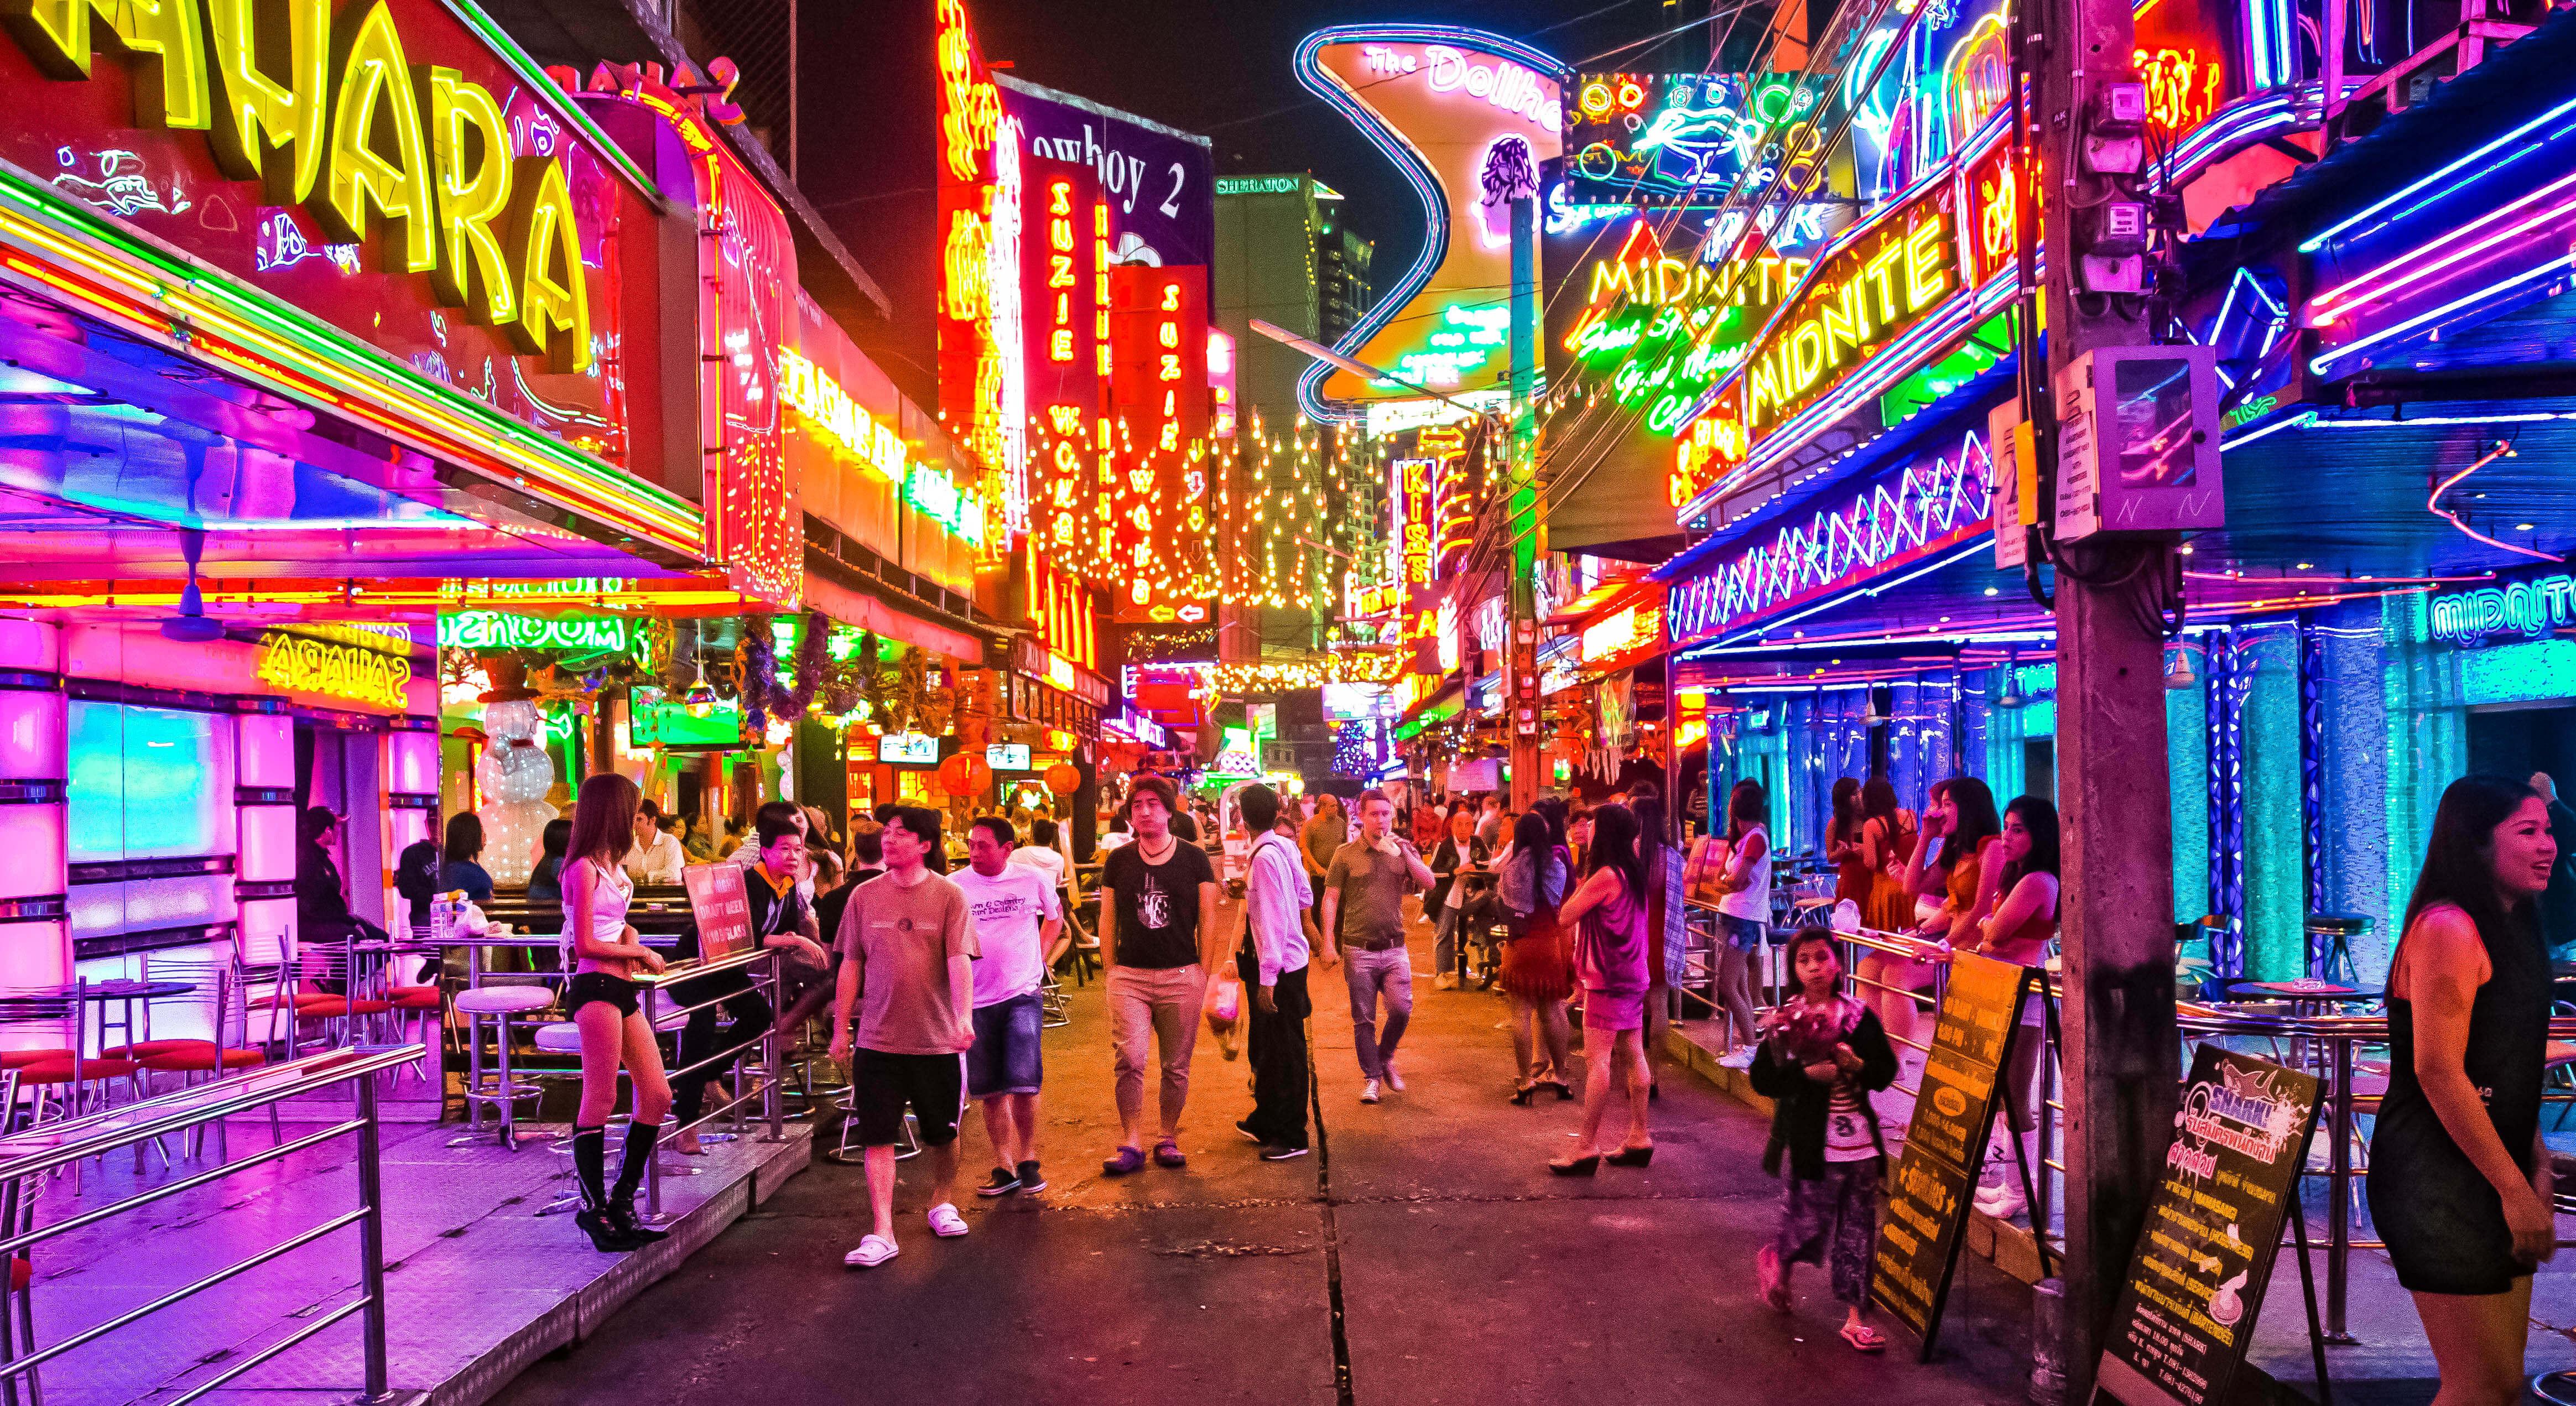 bangkok stockholm sex filmer free